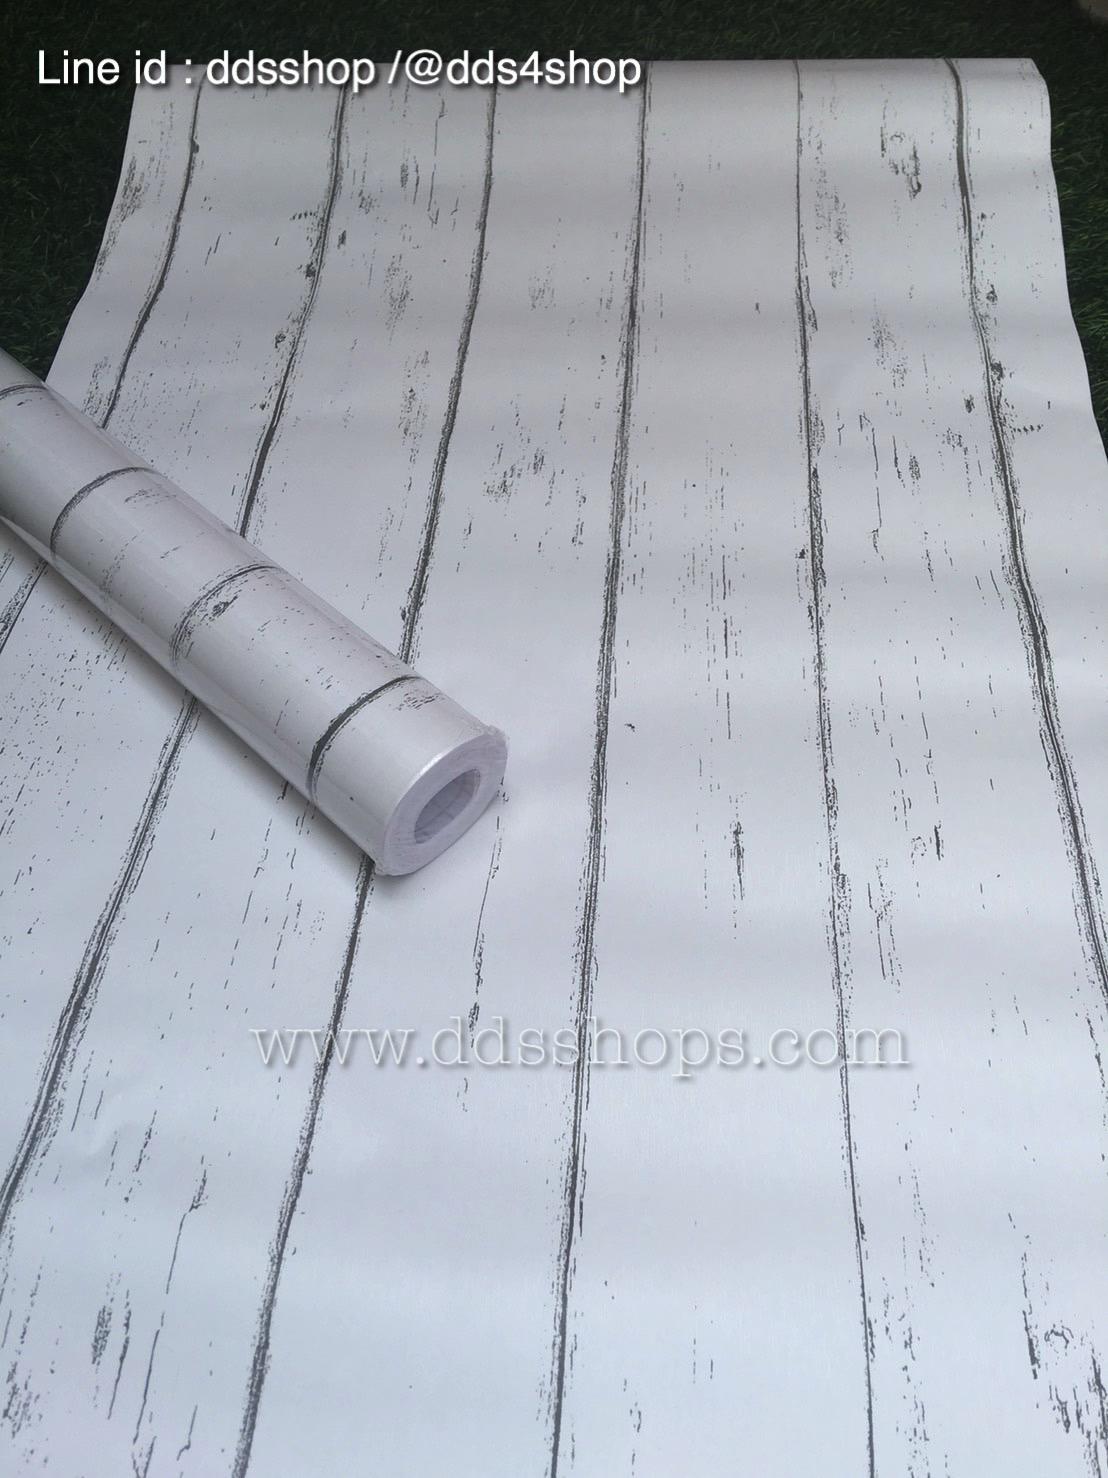 "Wallpaper Sticker วอลล์เปเปอร์แบบมีกาวในตัว ""ลายไม้สีขาว"" กว้าง 45cm x 10m"